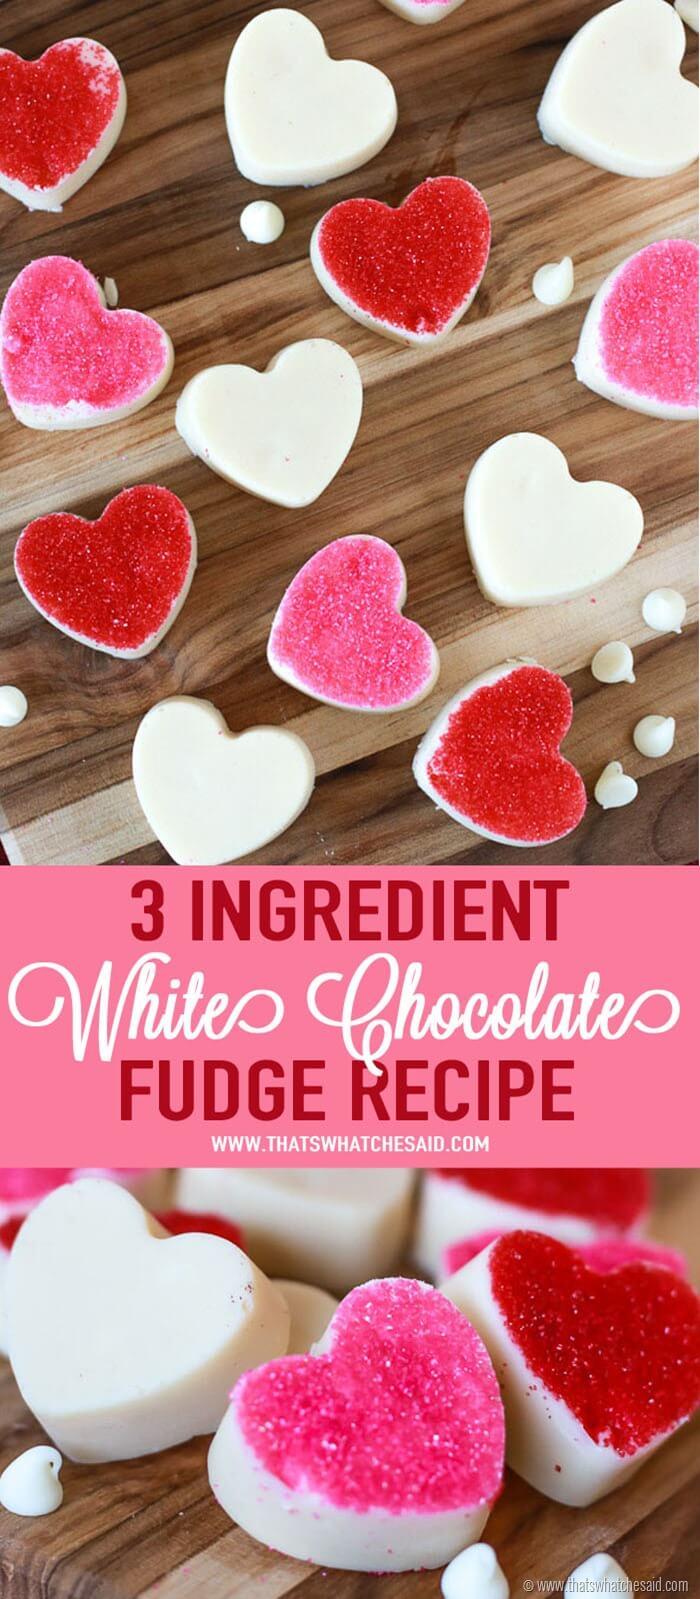 3 Ingredient White Chocolate Fudge Recipe at www.thatswhatchesaid.com